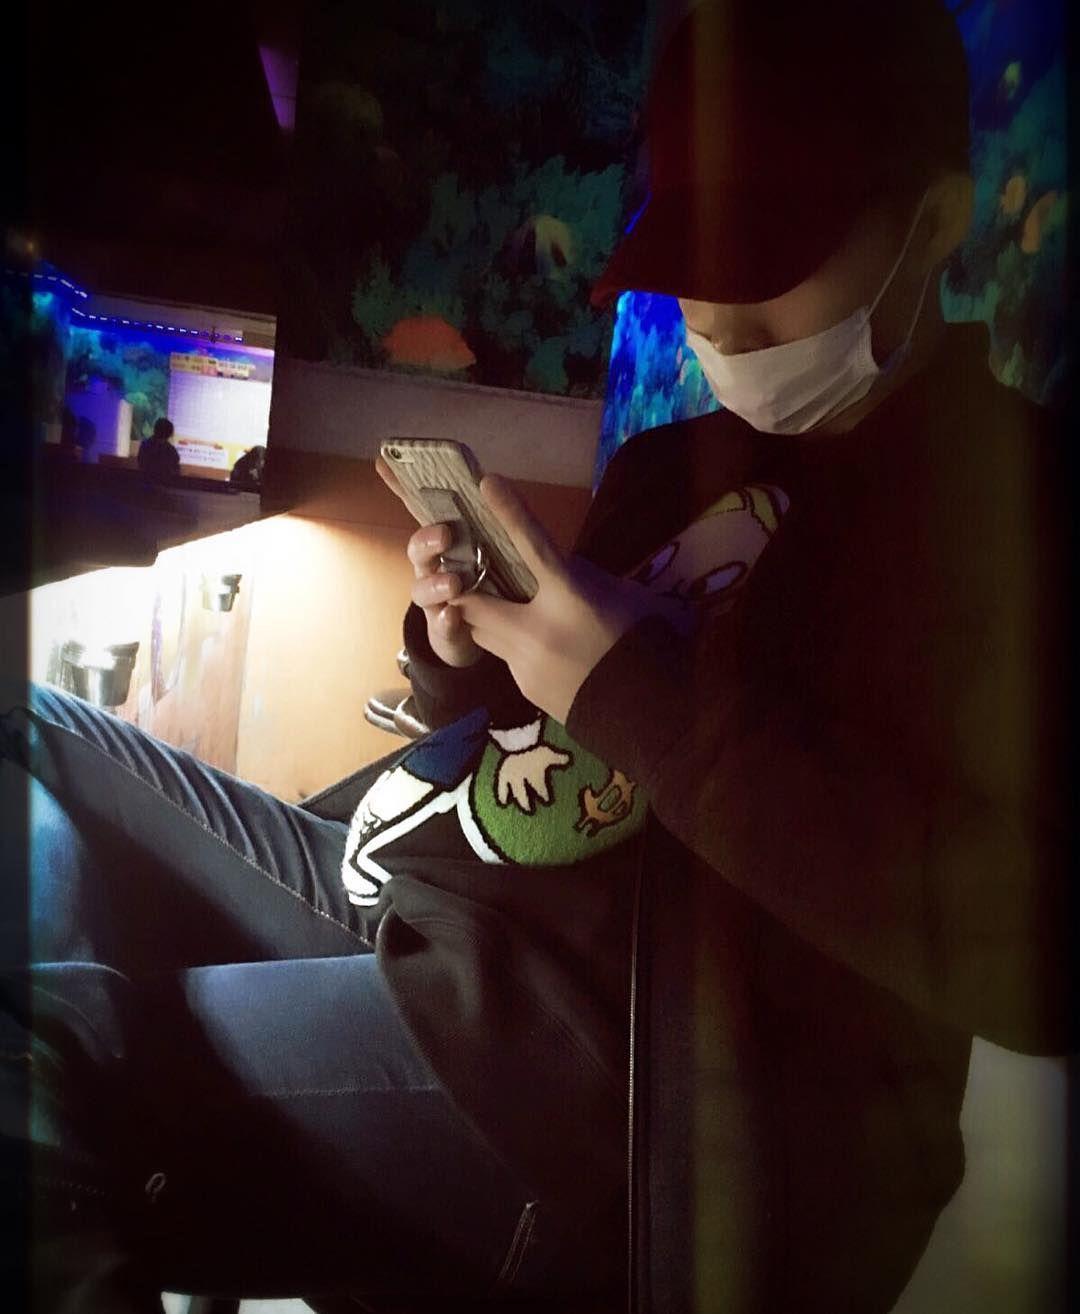 #AKMU #Chanhyuk IG : 비를 쫄딱 맞아버림.. 감기 조심해요ㅜㅠ #저는걸려버림 #크닐